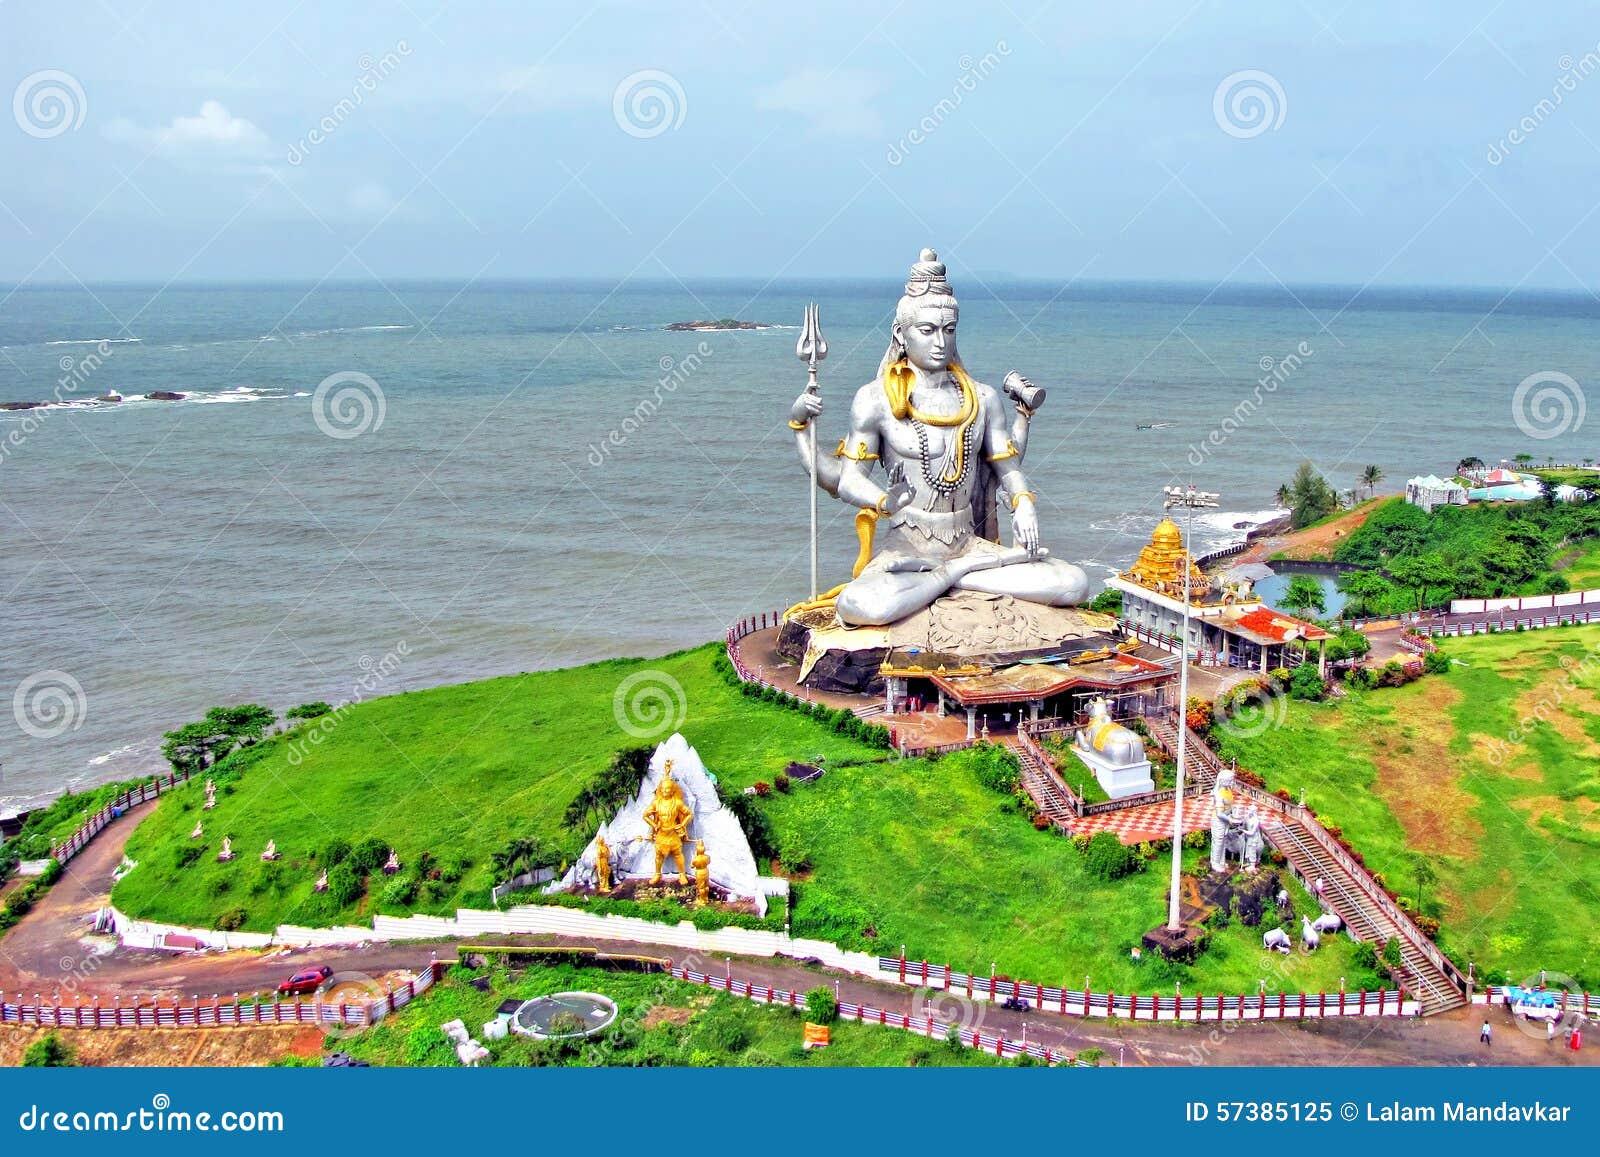 Lord Shiva Murdeshwar, India